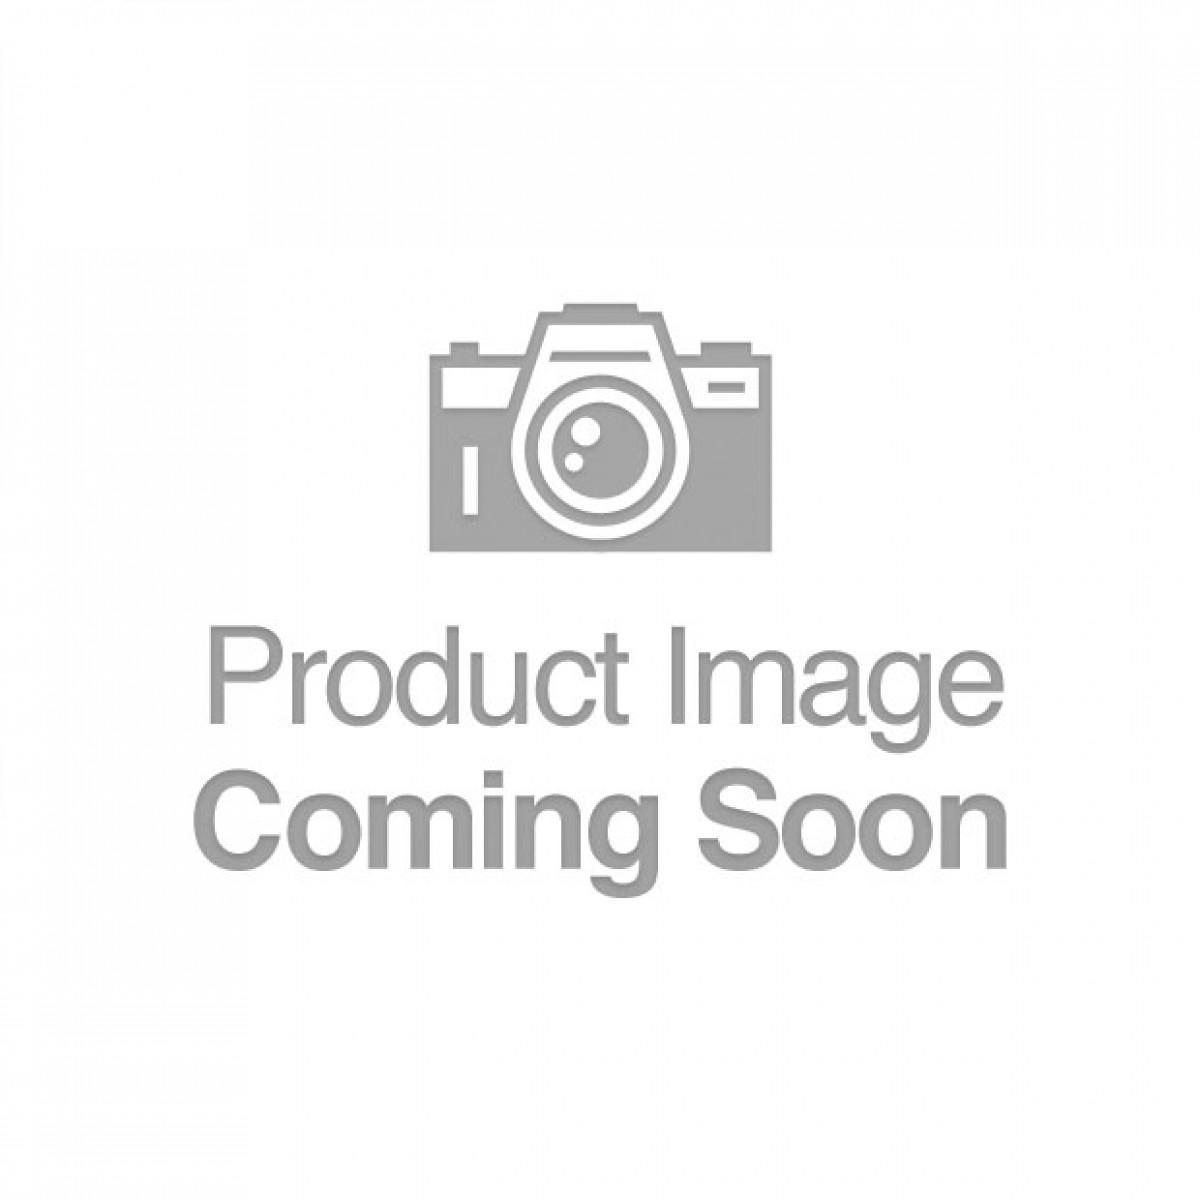 Blush Wellness G Ball Vibrator - Purple